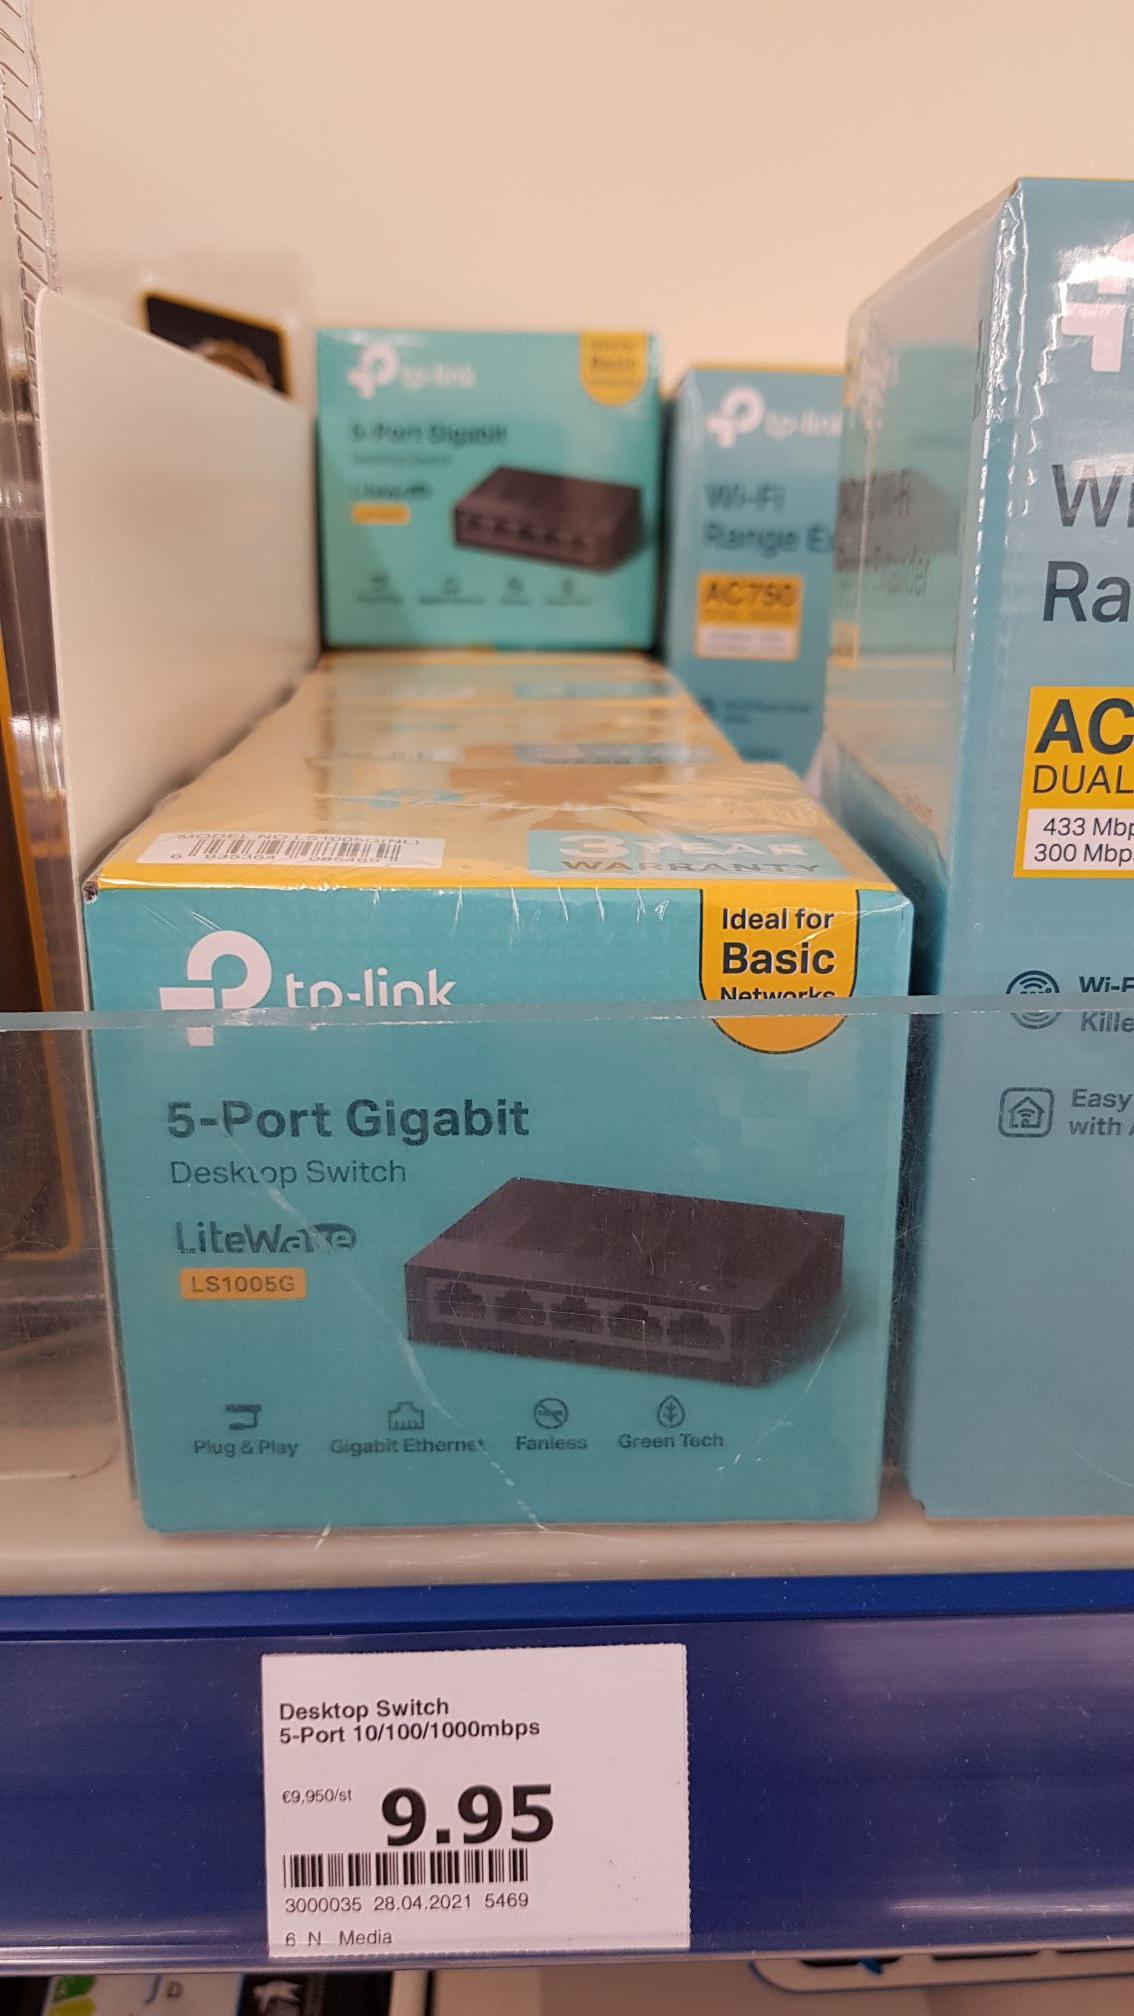 [Offline] Action TP-link Gigabit Switch LS1005G